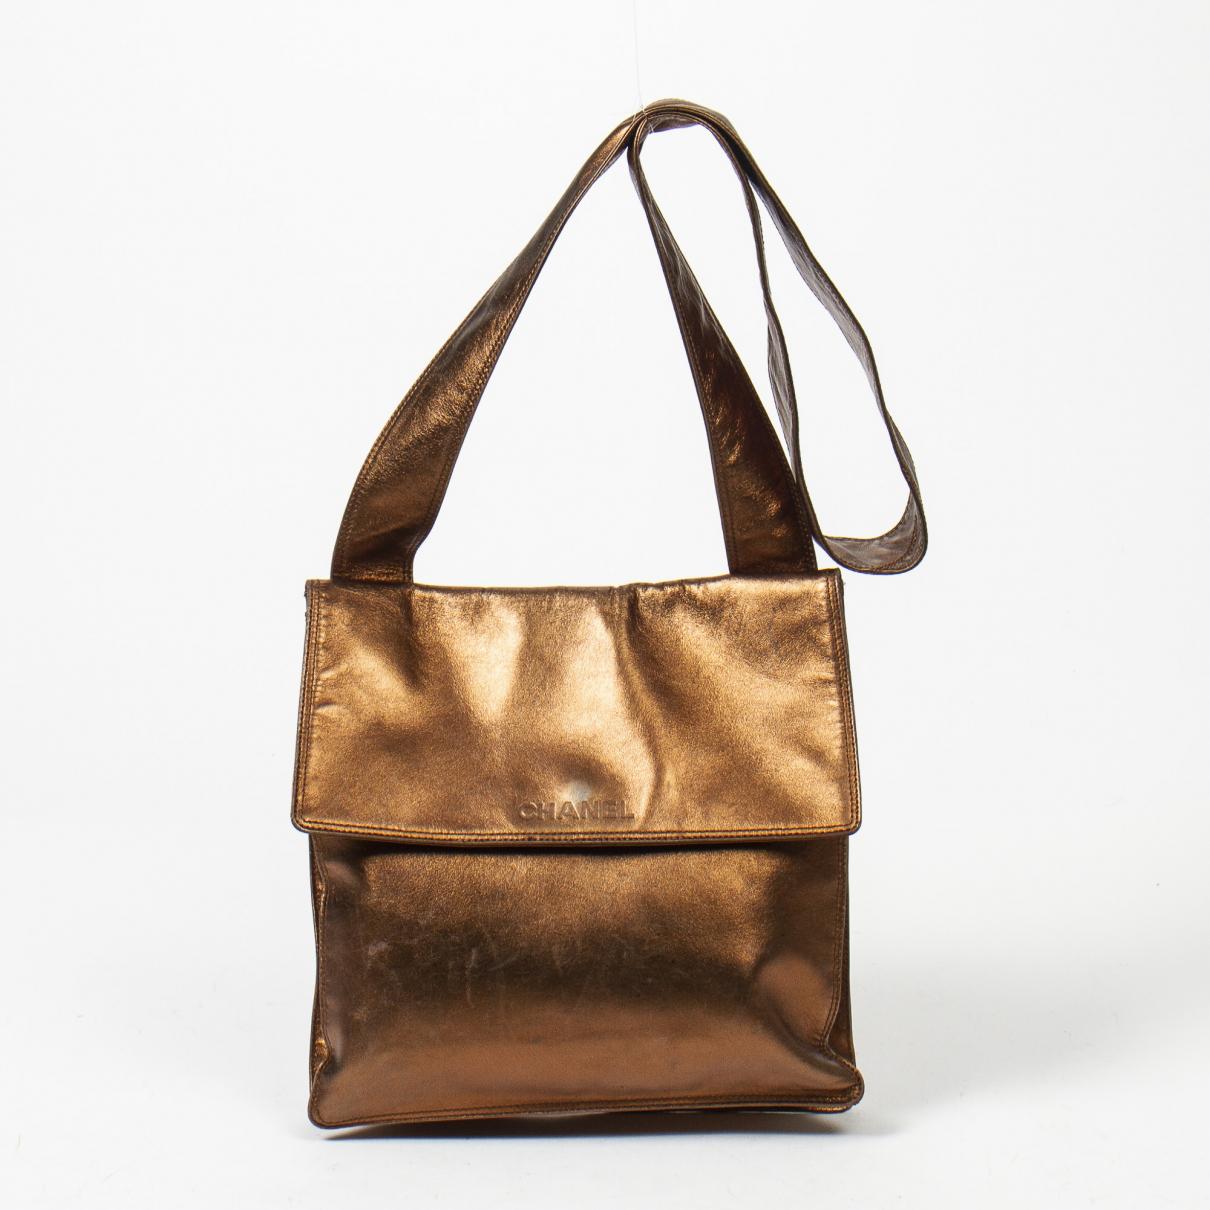 Chanel \N Leather handbag for Women \N